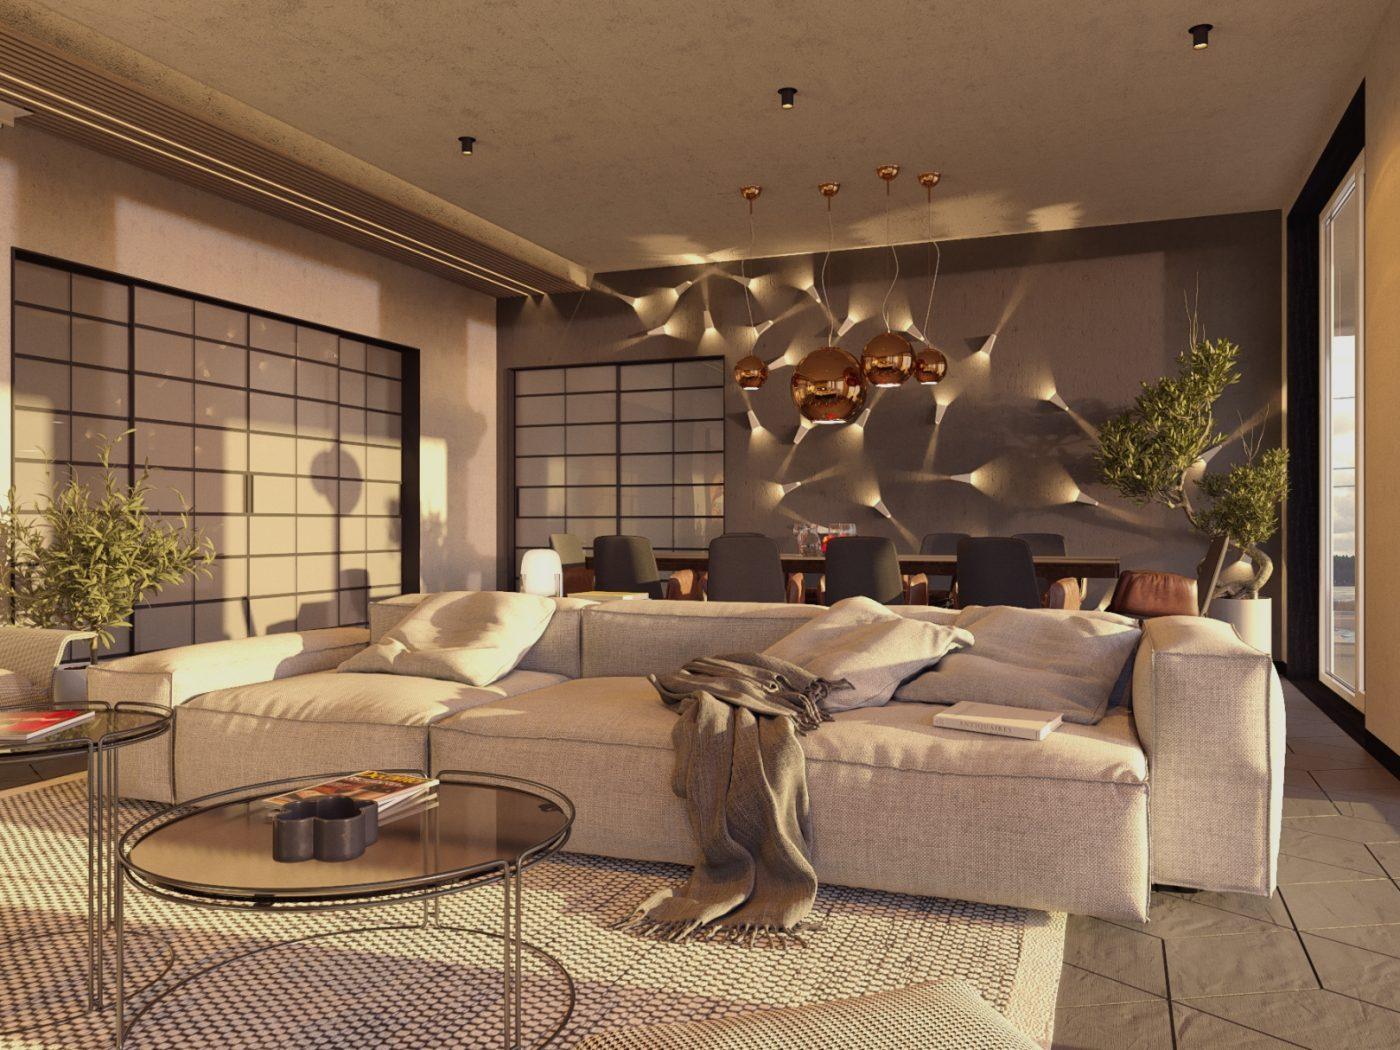 design of home furniture. MANSION IN BALTEZERS Design Of Home Furniture